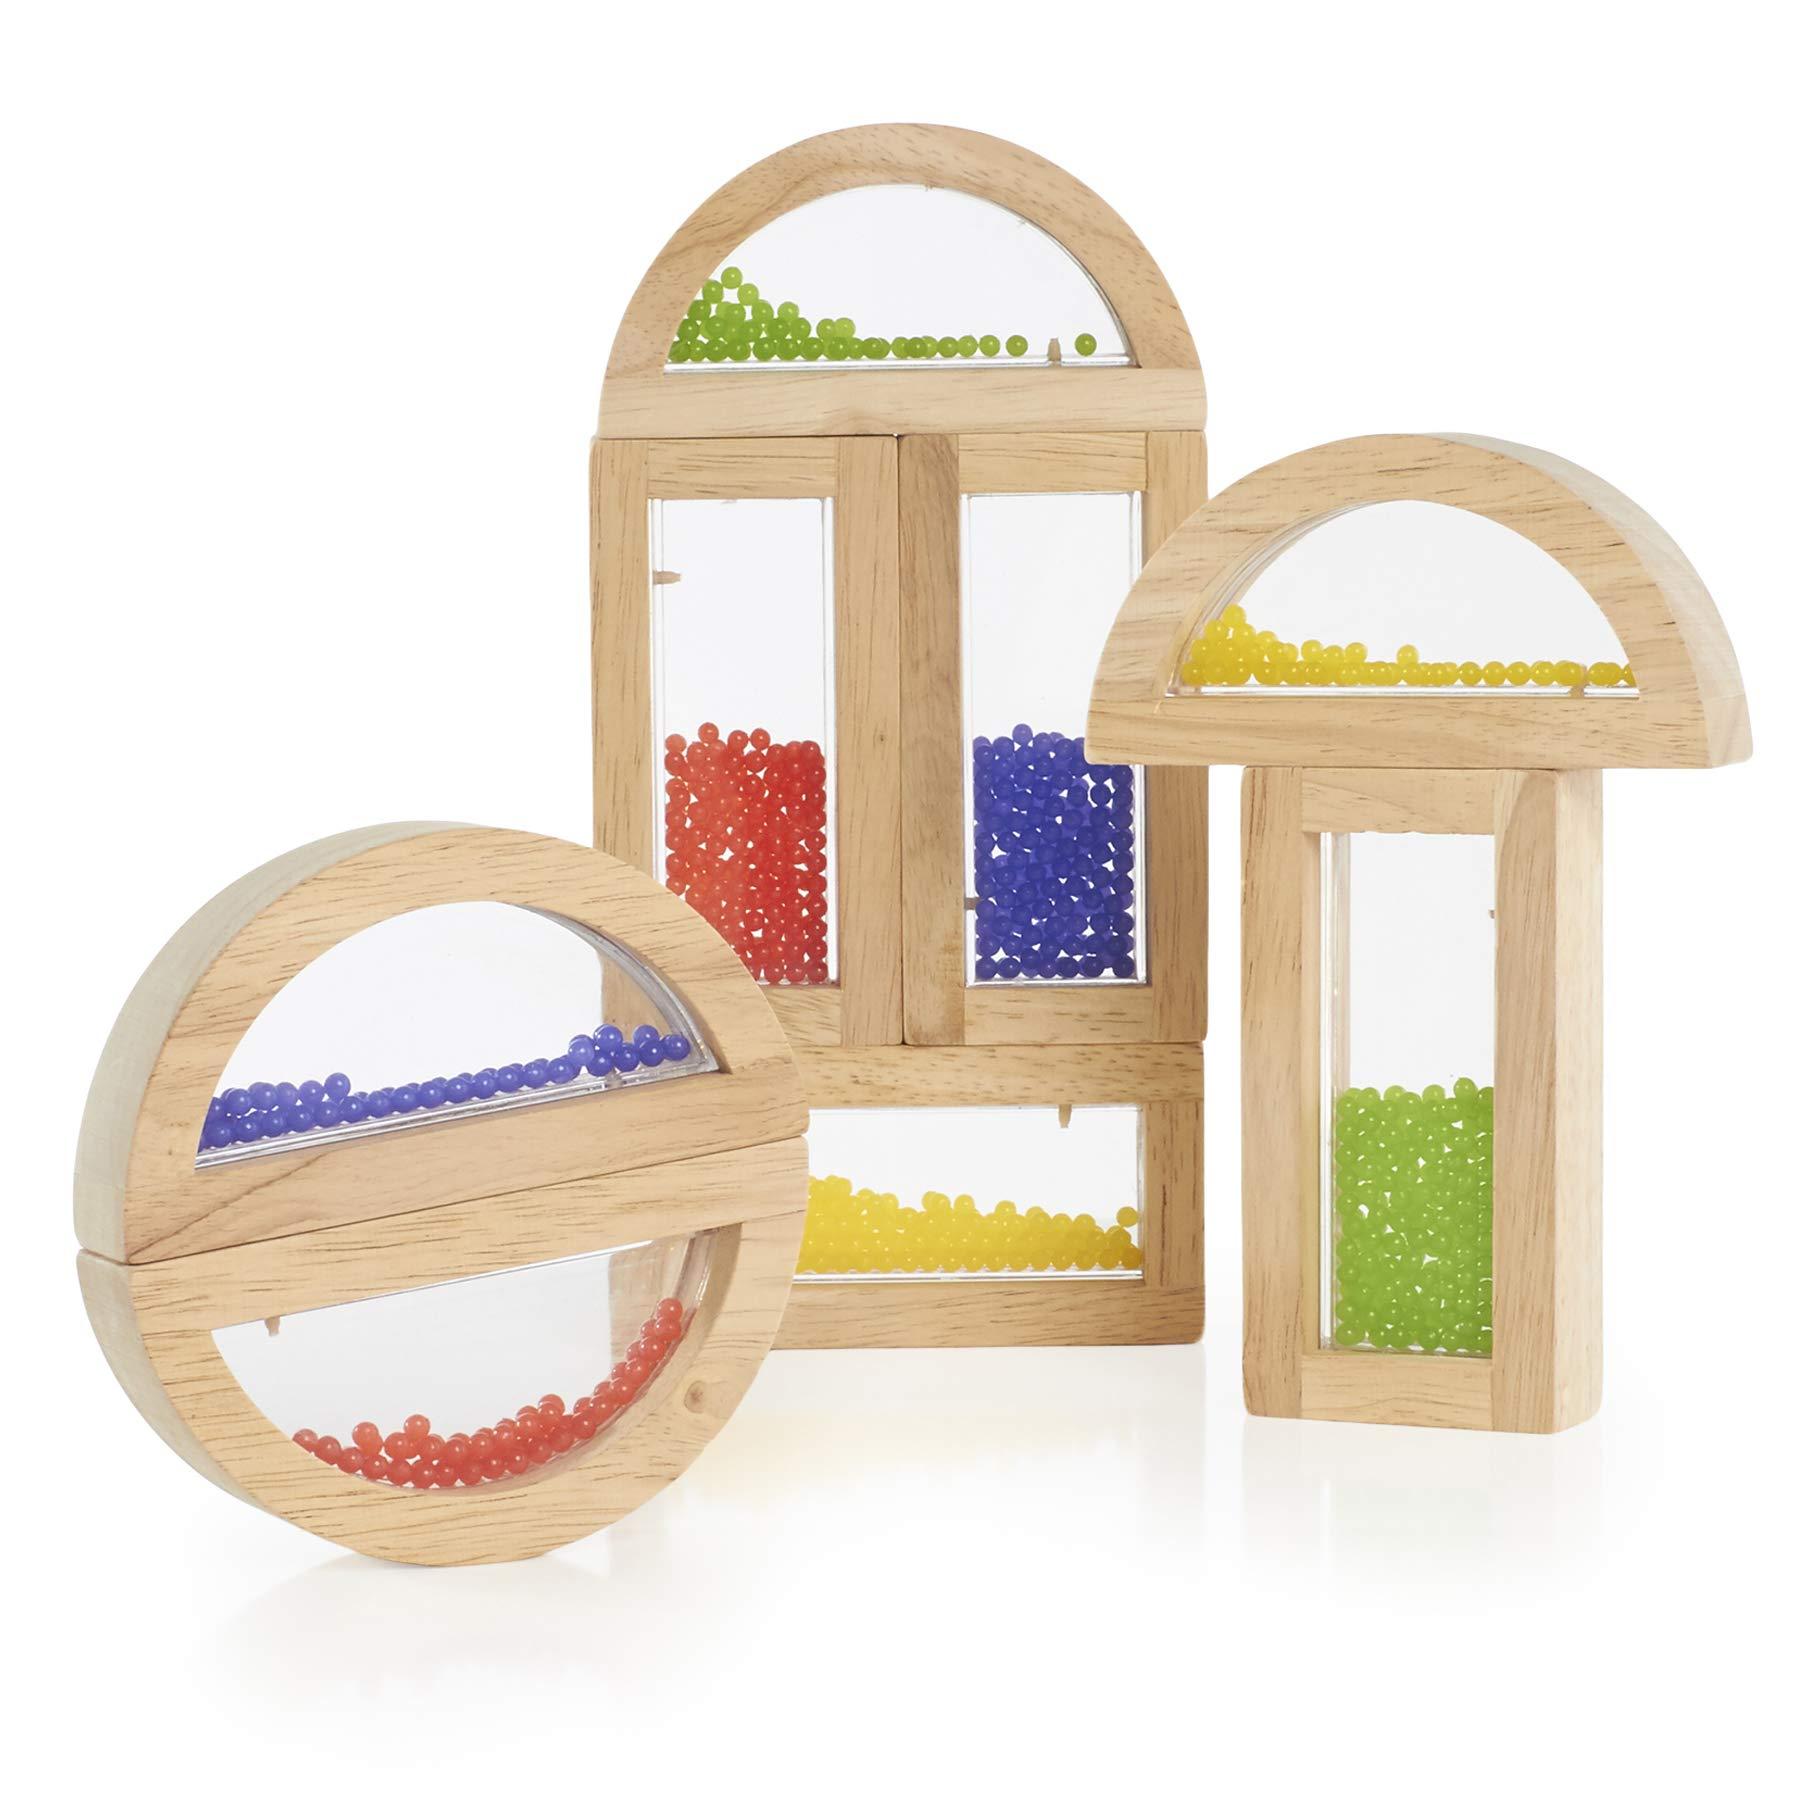 Guidecraft Rainbow Blocks - Crystal Bead, Educational Toy for Kids - Stacking Blocks